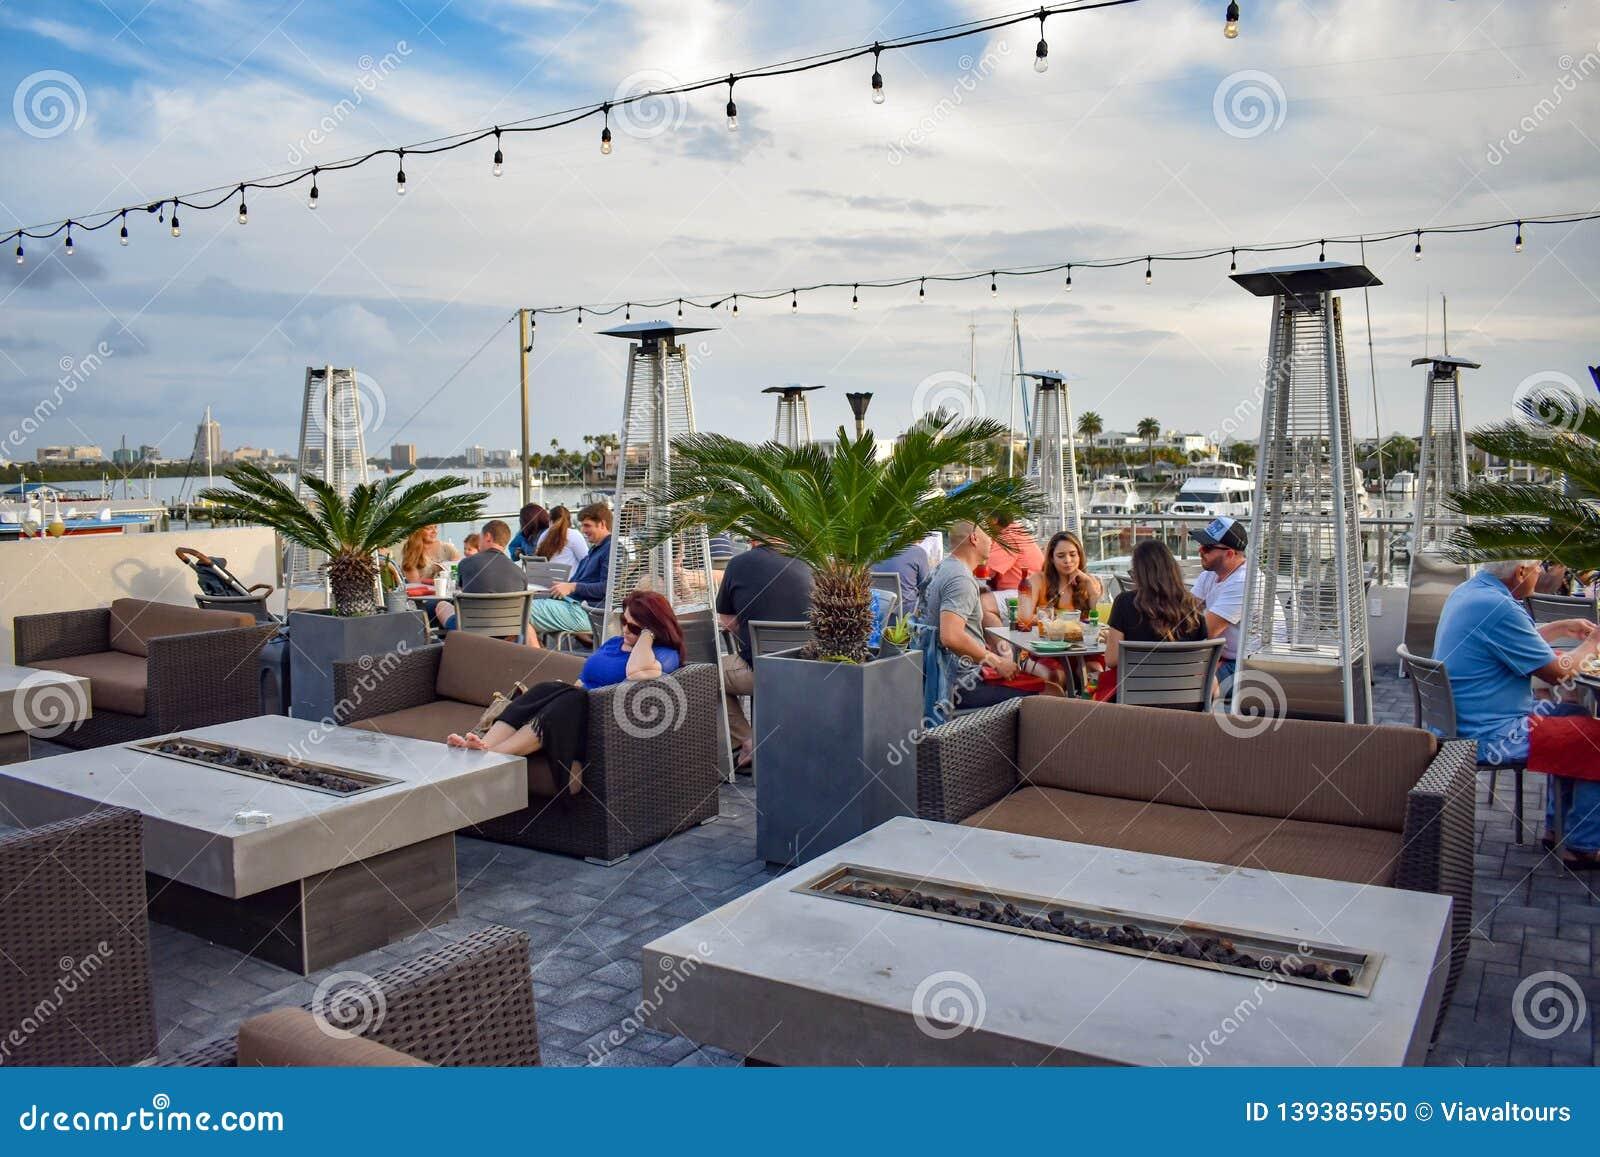 People Enjoying Seafood In Restaurant Terrace Area In